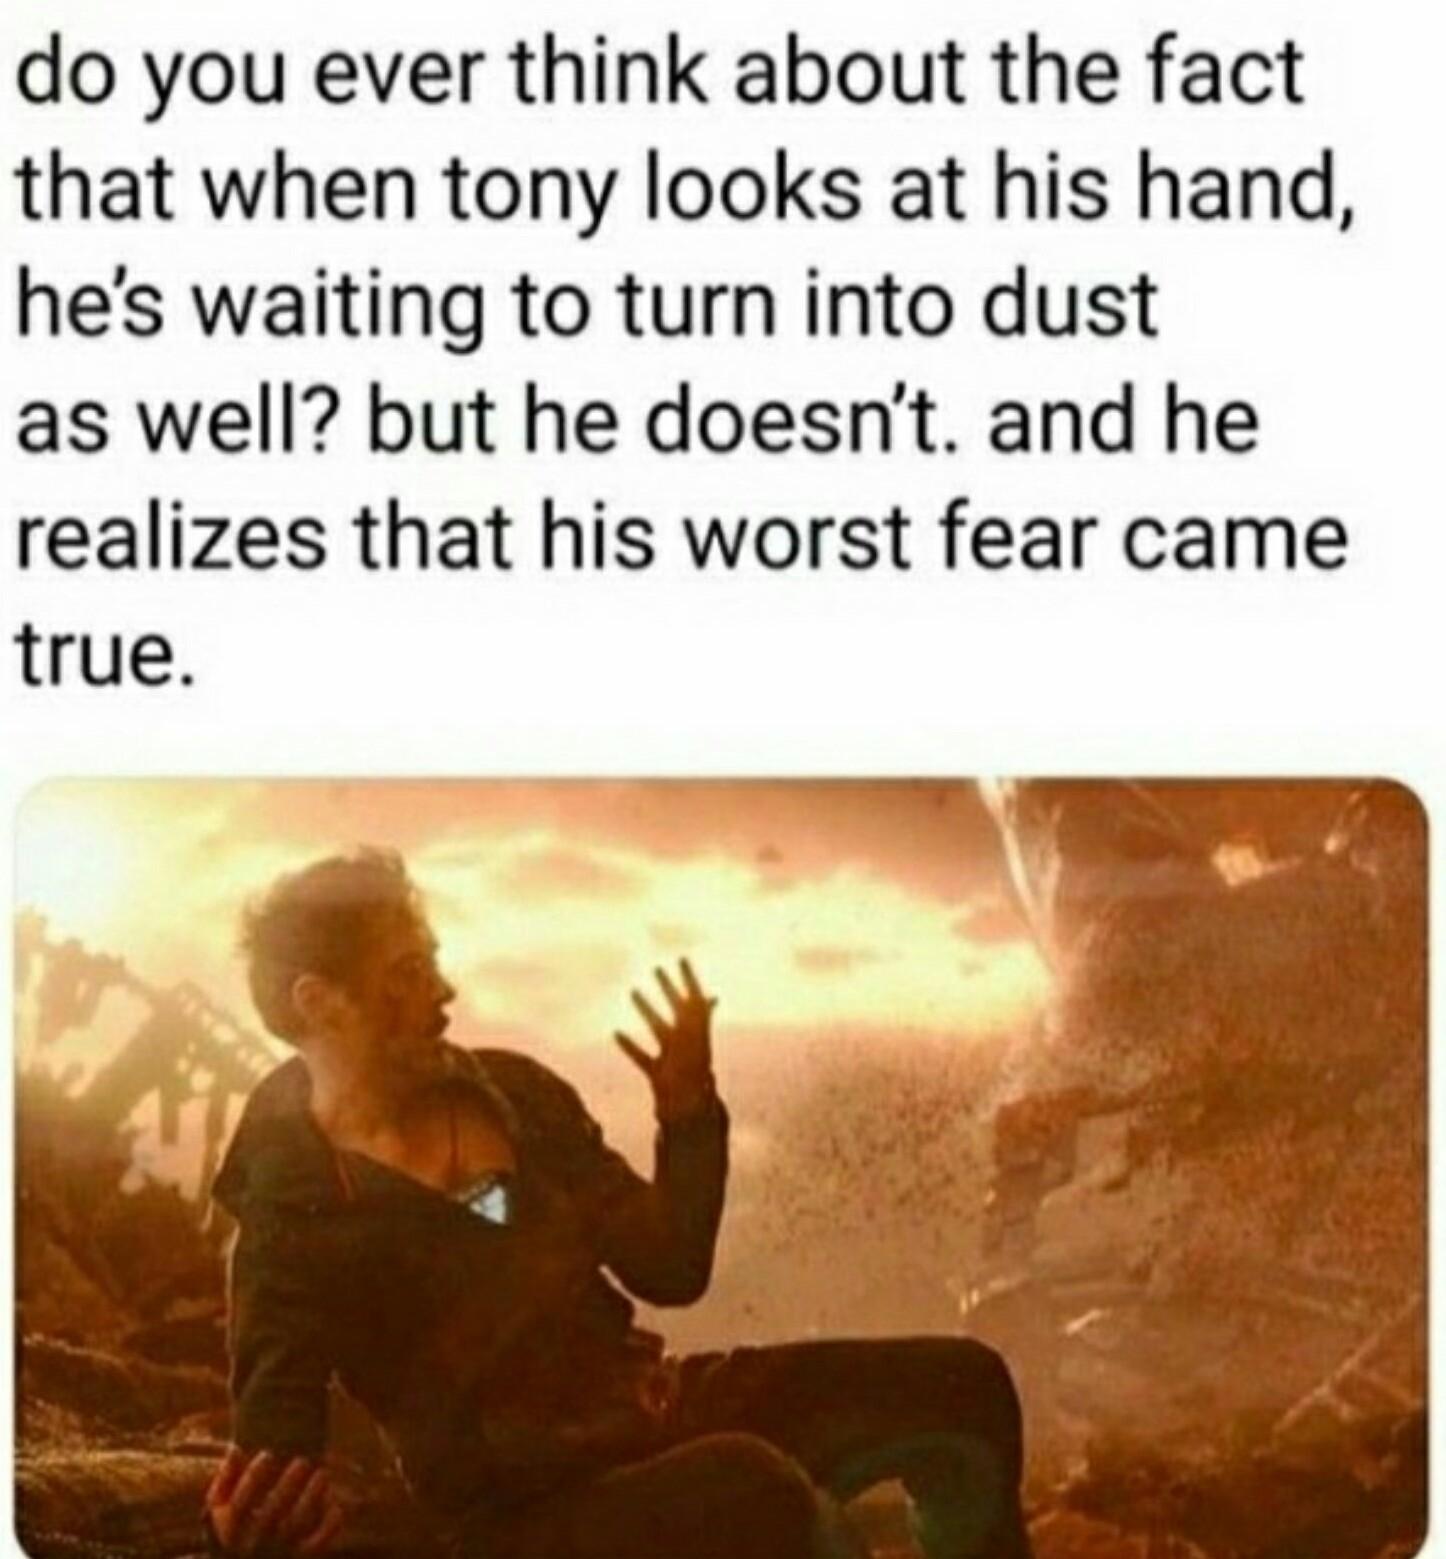 Oof, poor Tony. - meme